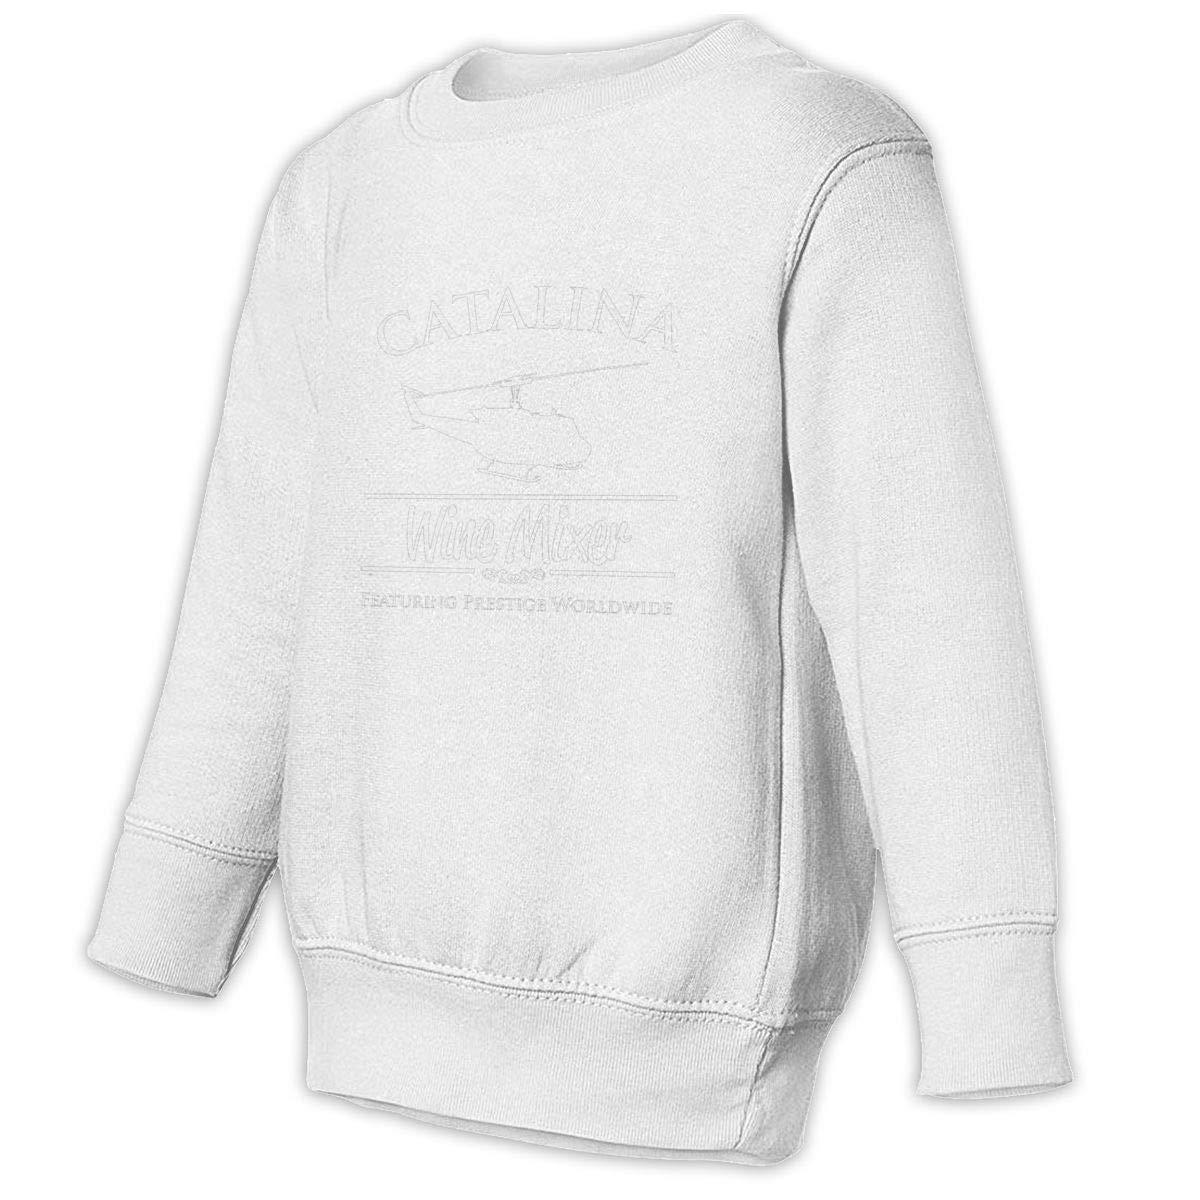 Stylish Shop Catalina Wine Mixer Prestige Worldwide Kids Boys Toddler Juvenile Sweatshirt